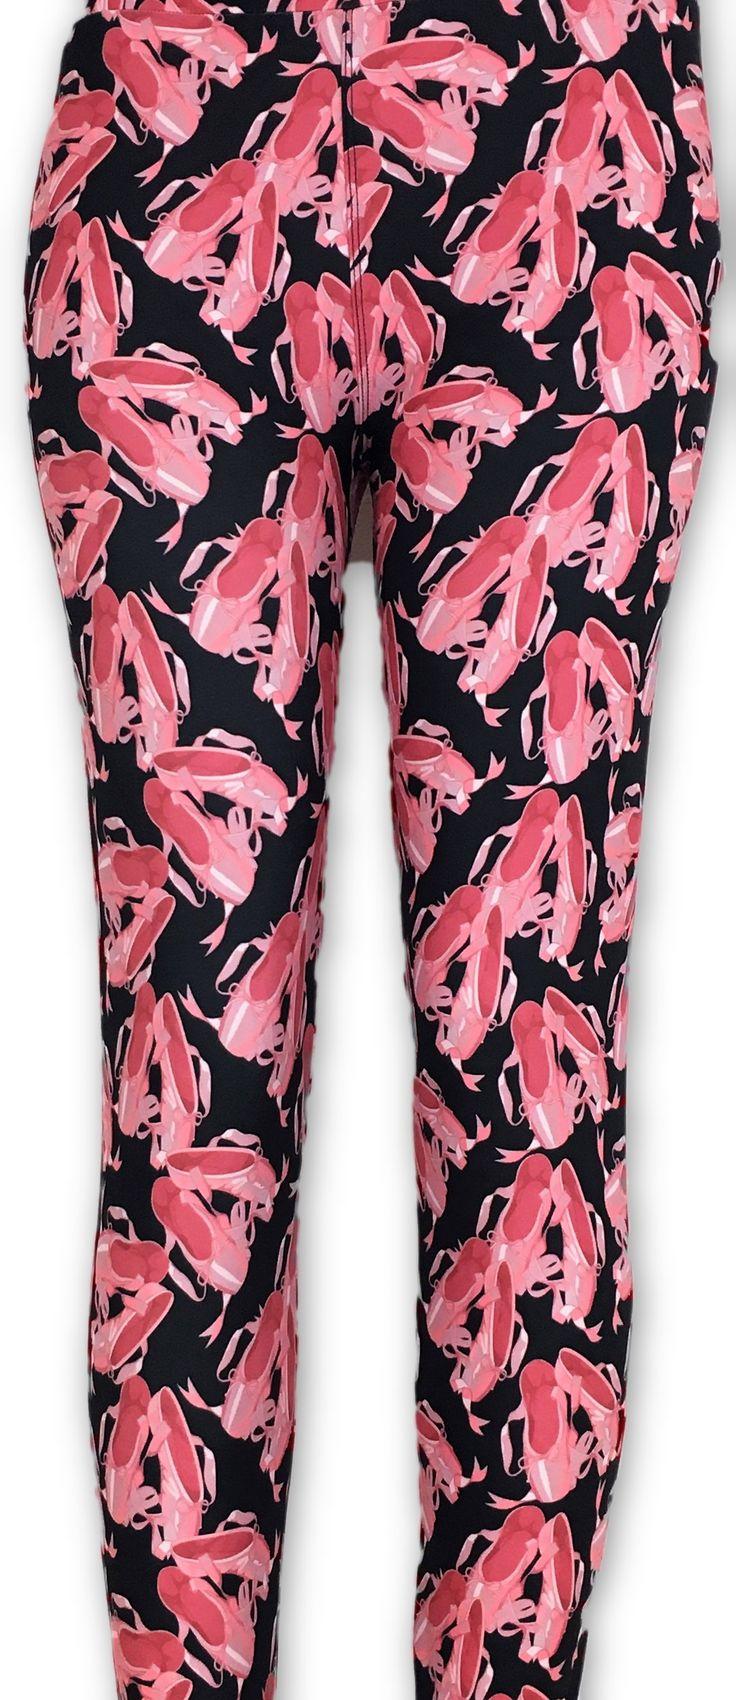 Ballerina Pink Slippers